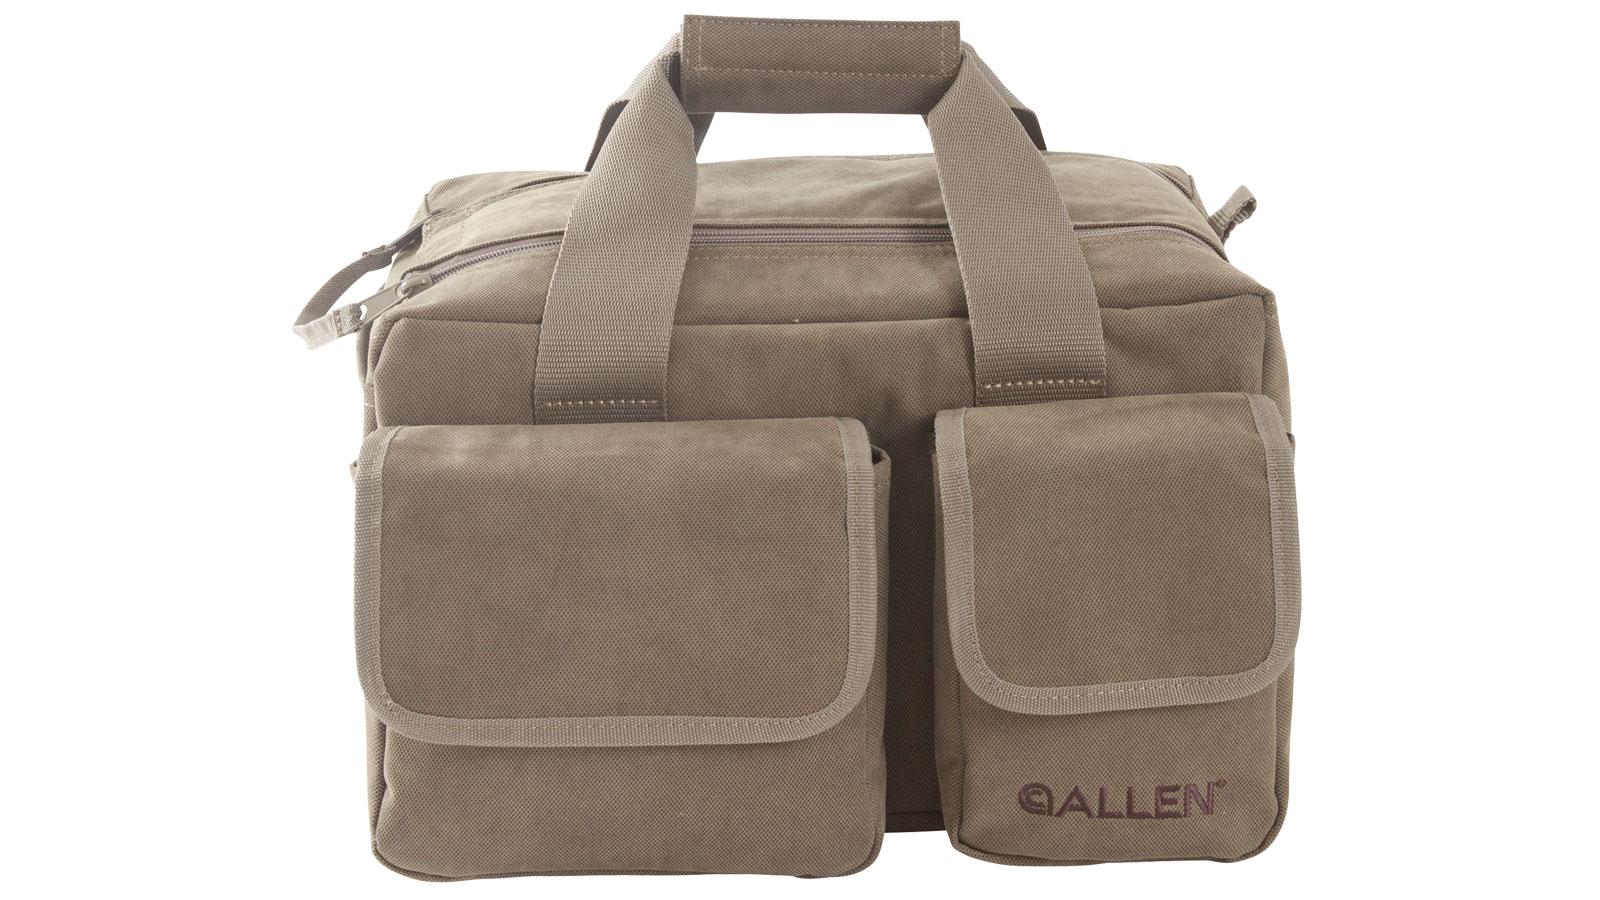 Allen CANVAS RANGE BAG